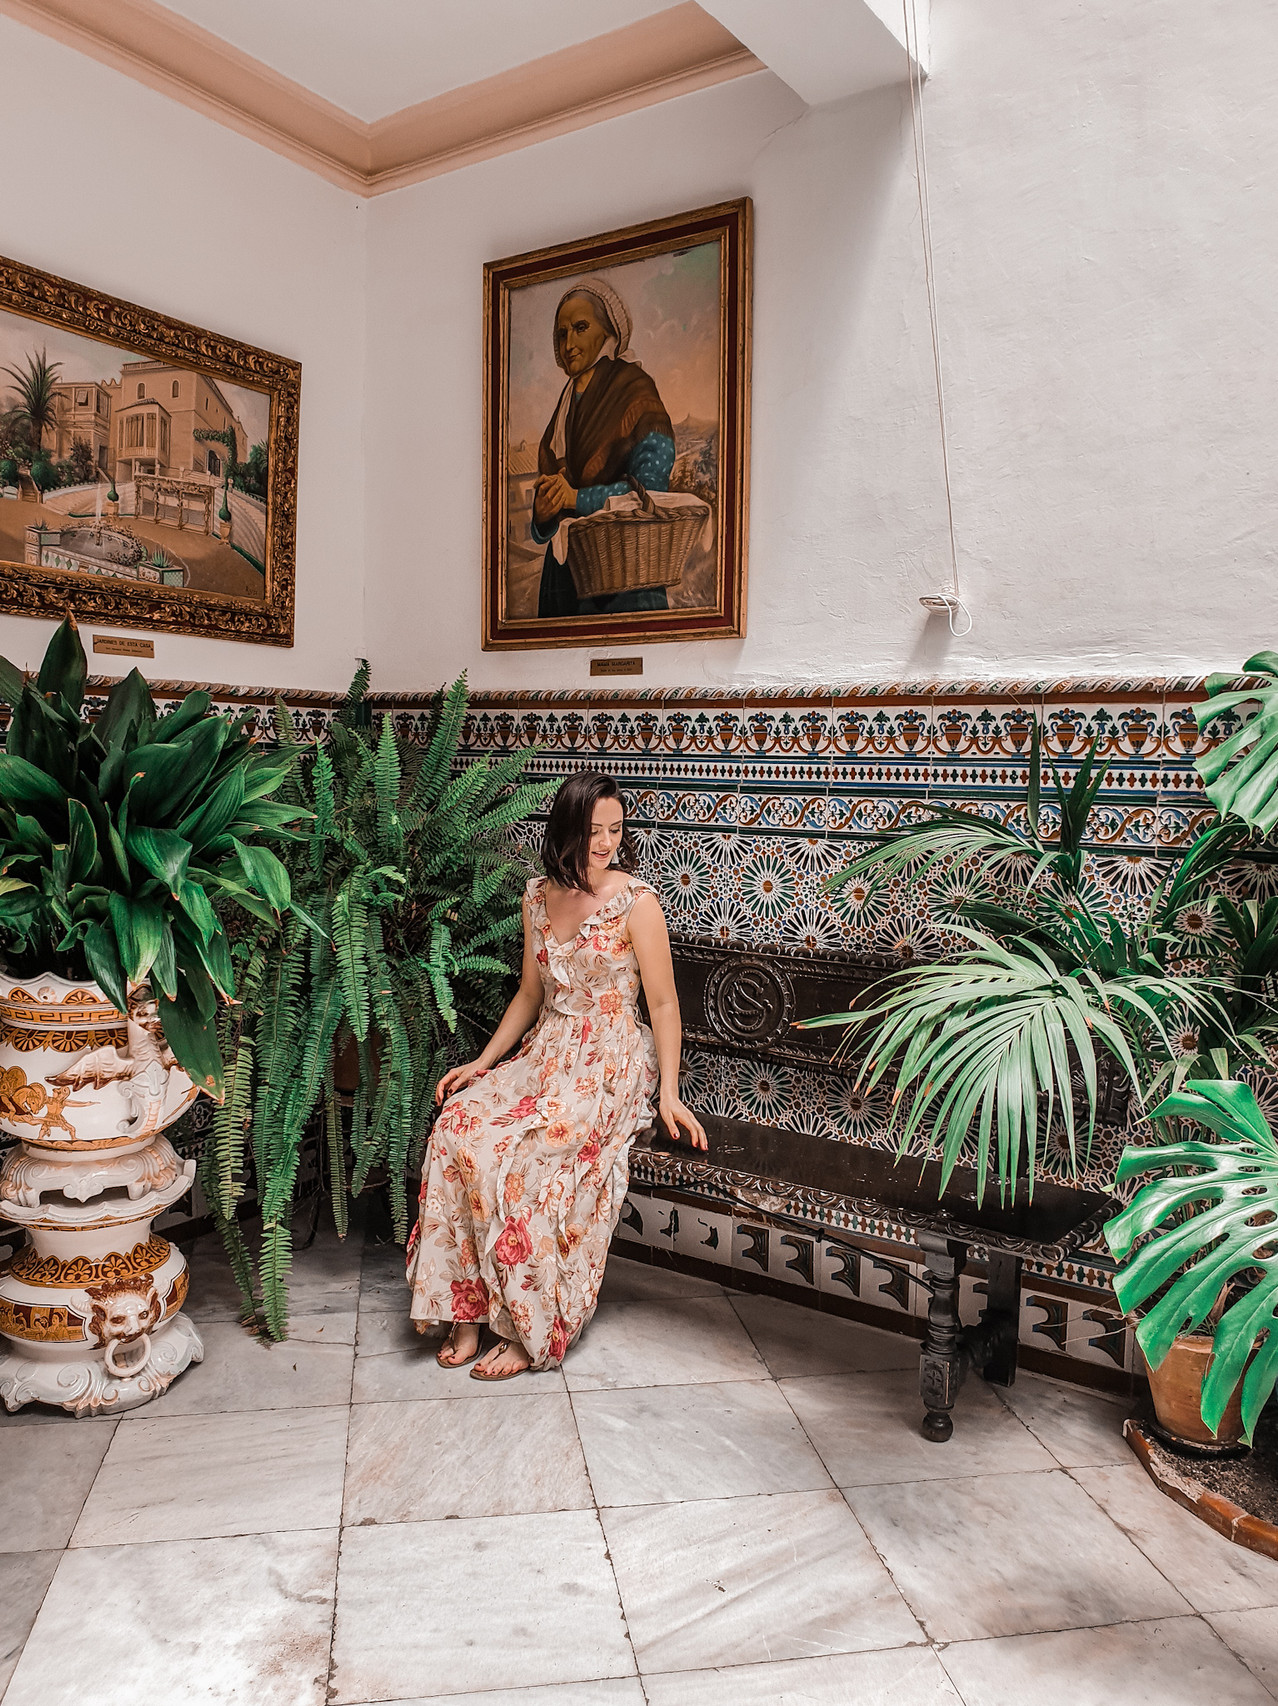 "Ronda ""Don Bosco House"" - Malaga- Andalusien- Olivia Libi"